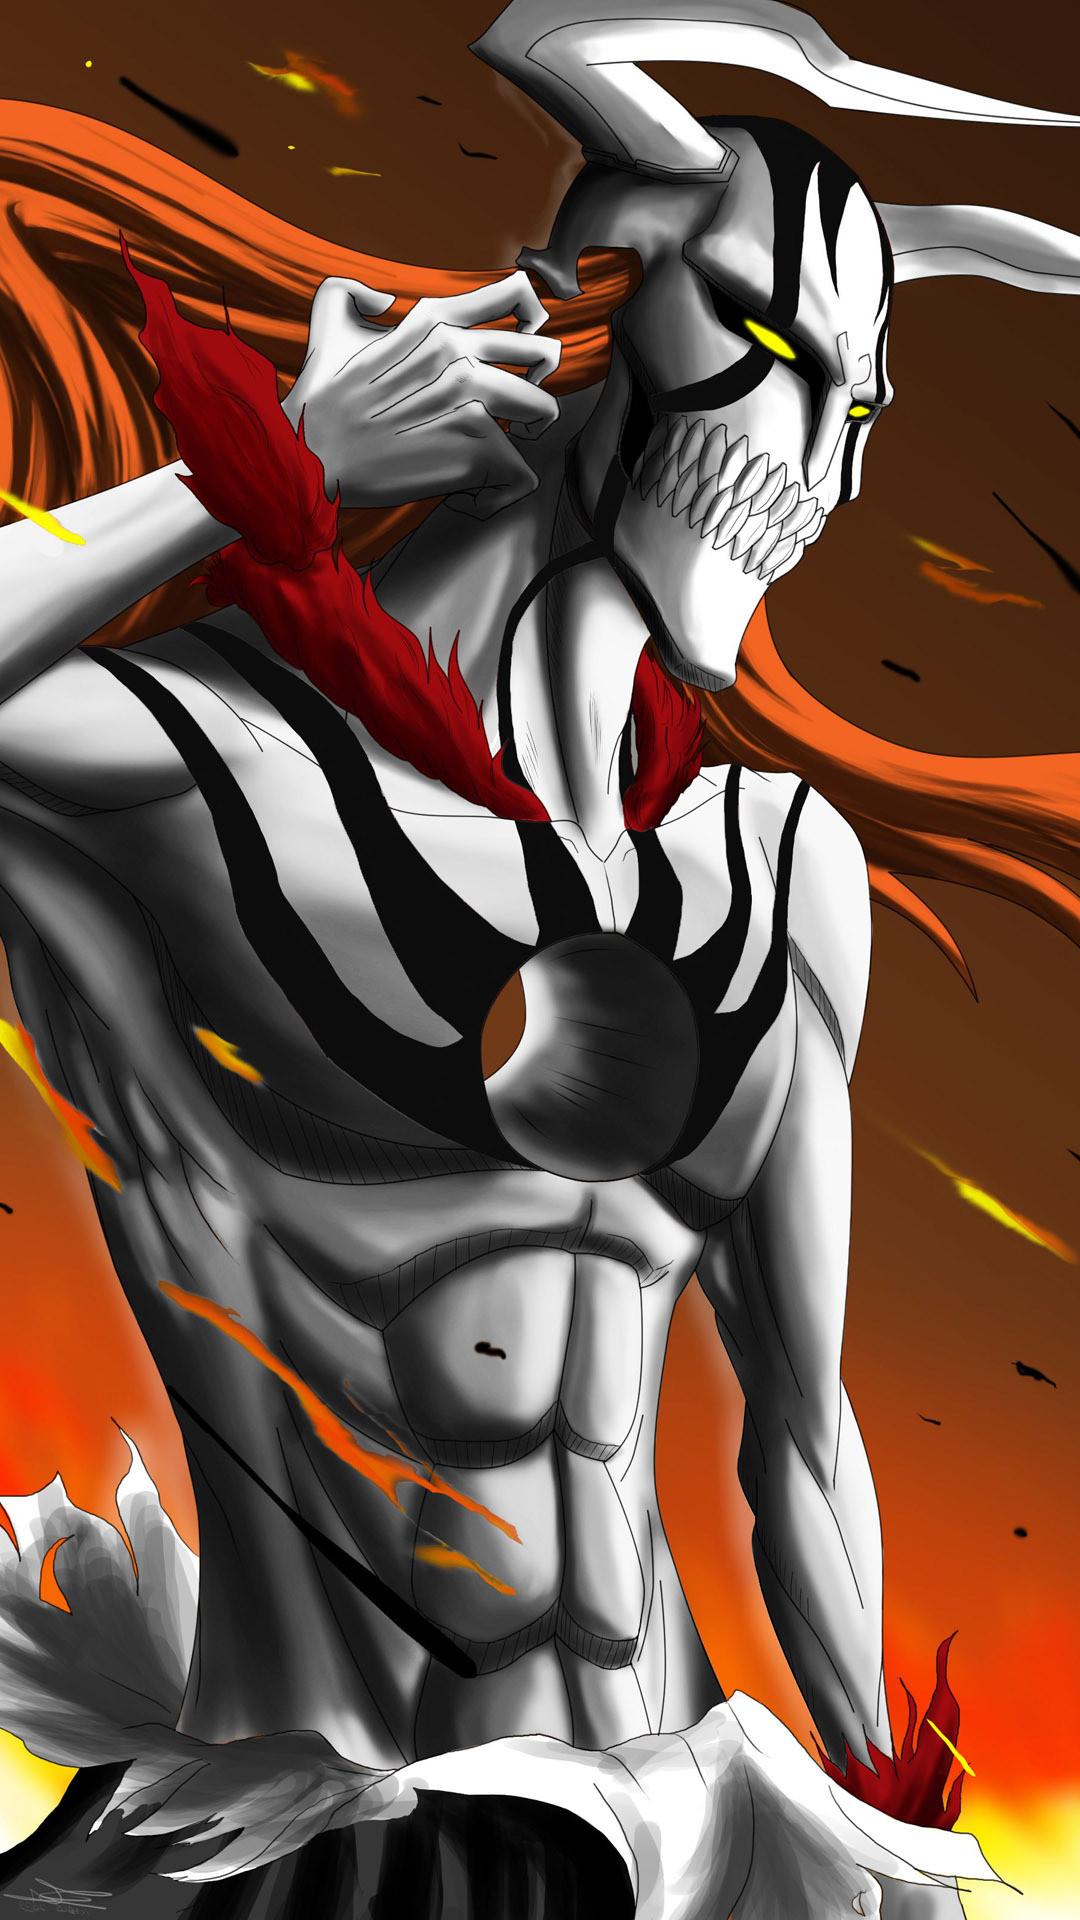 Ichigo vasto lorde hd wallpapers 67 images - Anime mobile wallpaper ...